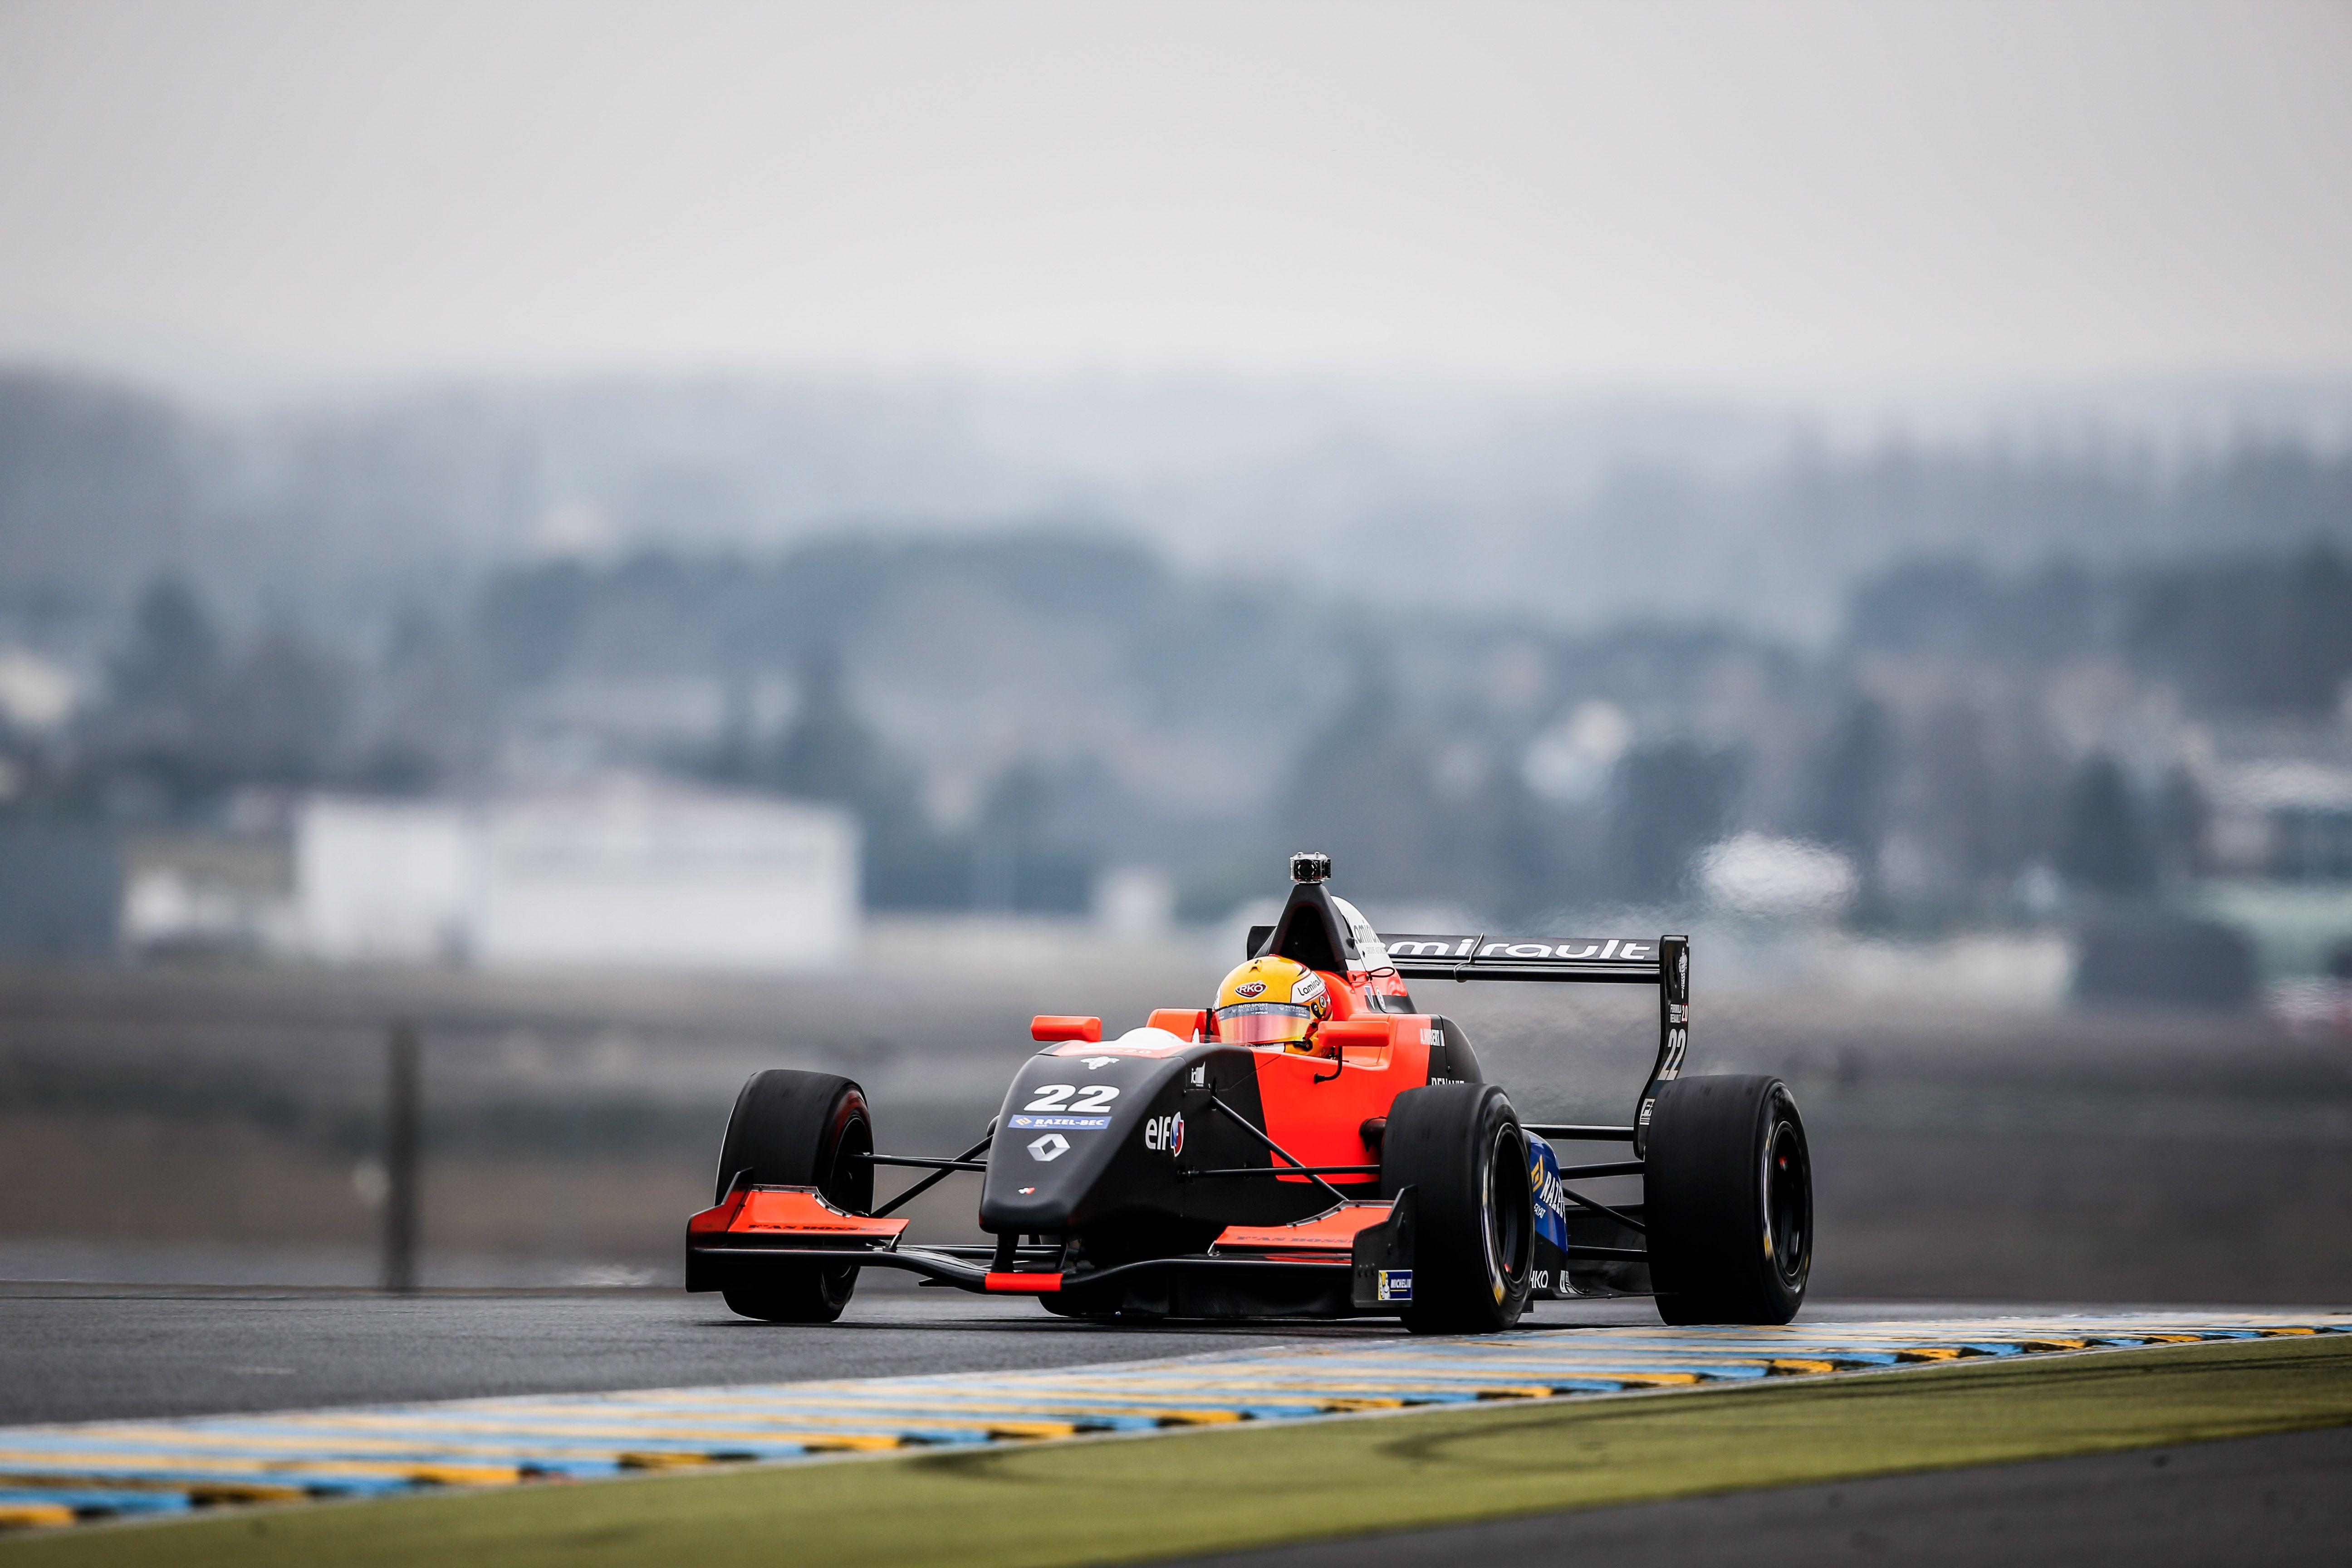 AUTO - FR 2.0 TESTS AT LE MANS 2015